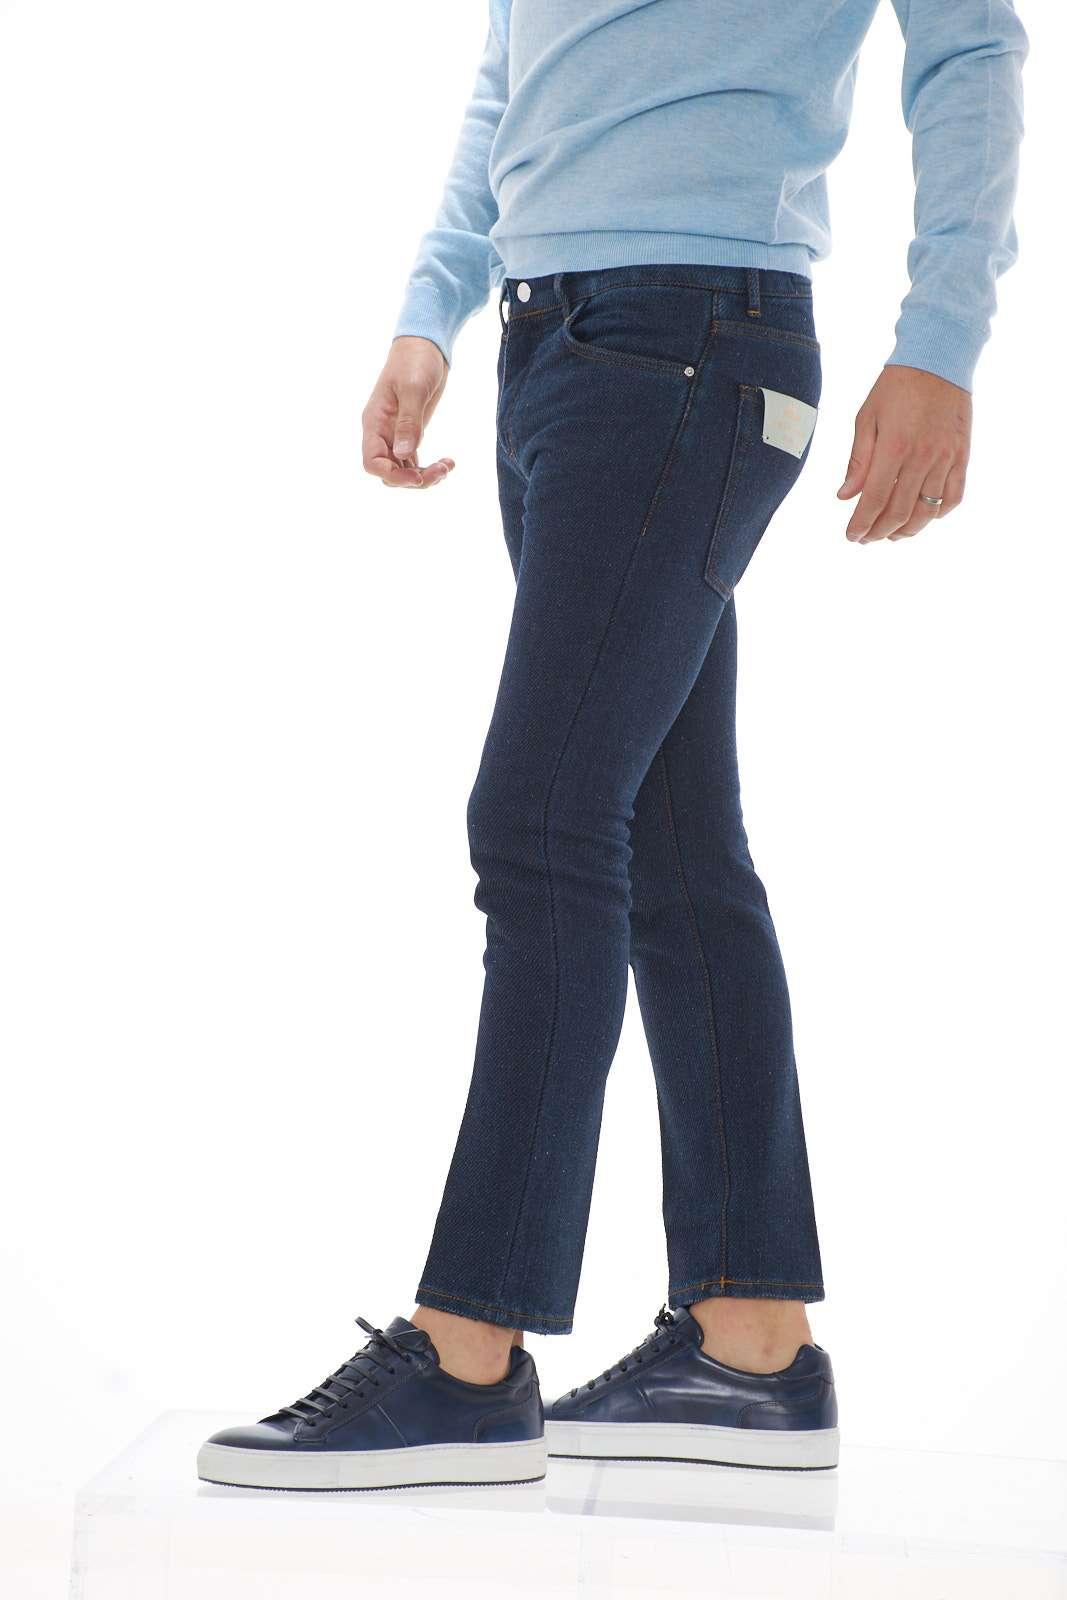 https://www.parmax.com/media/tmp/catalog/product/a/i/ai-outlet_parmax-pantaloni-uomo-entre-amis-a19gaga1208l457-b.jpg